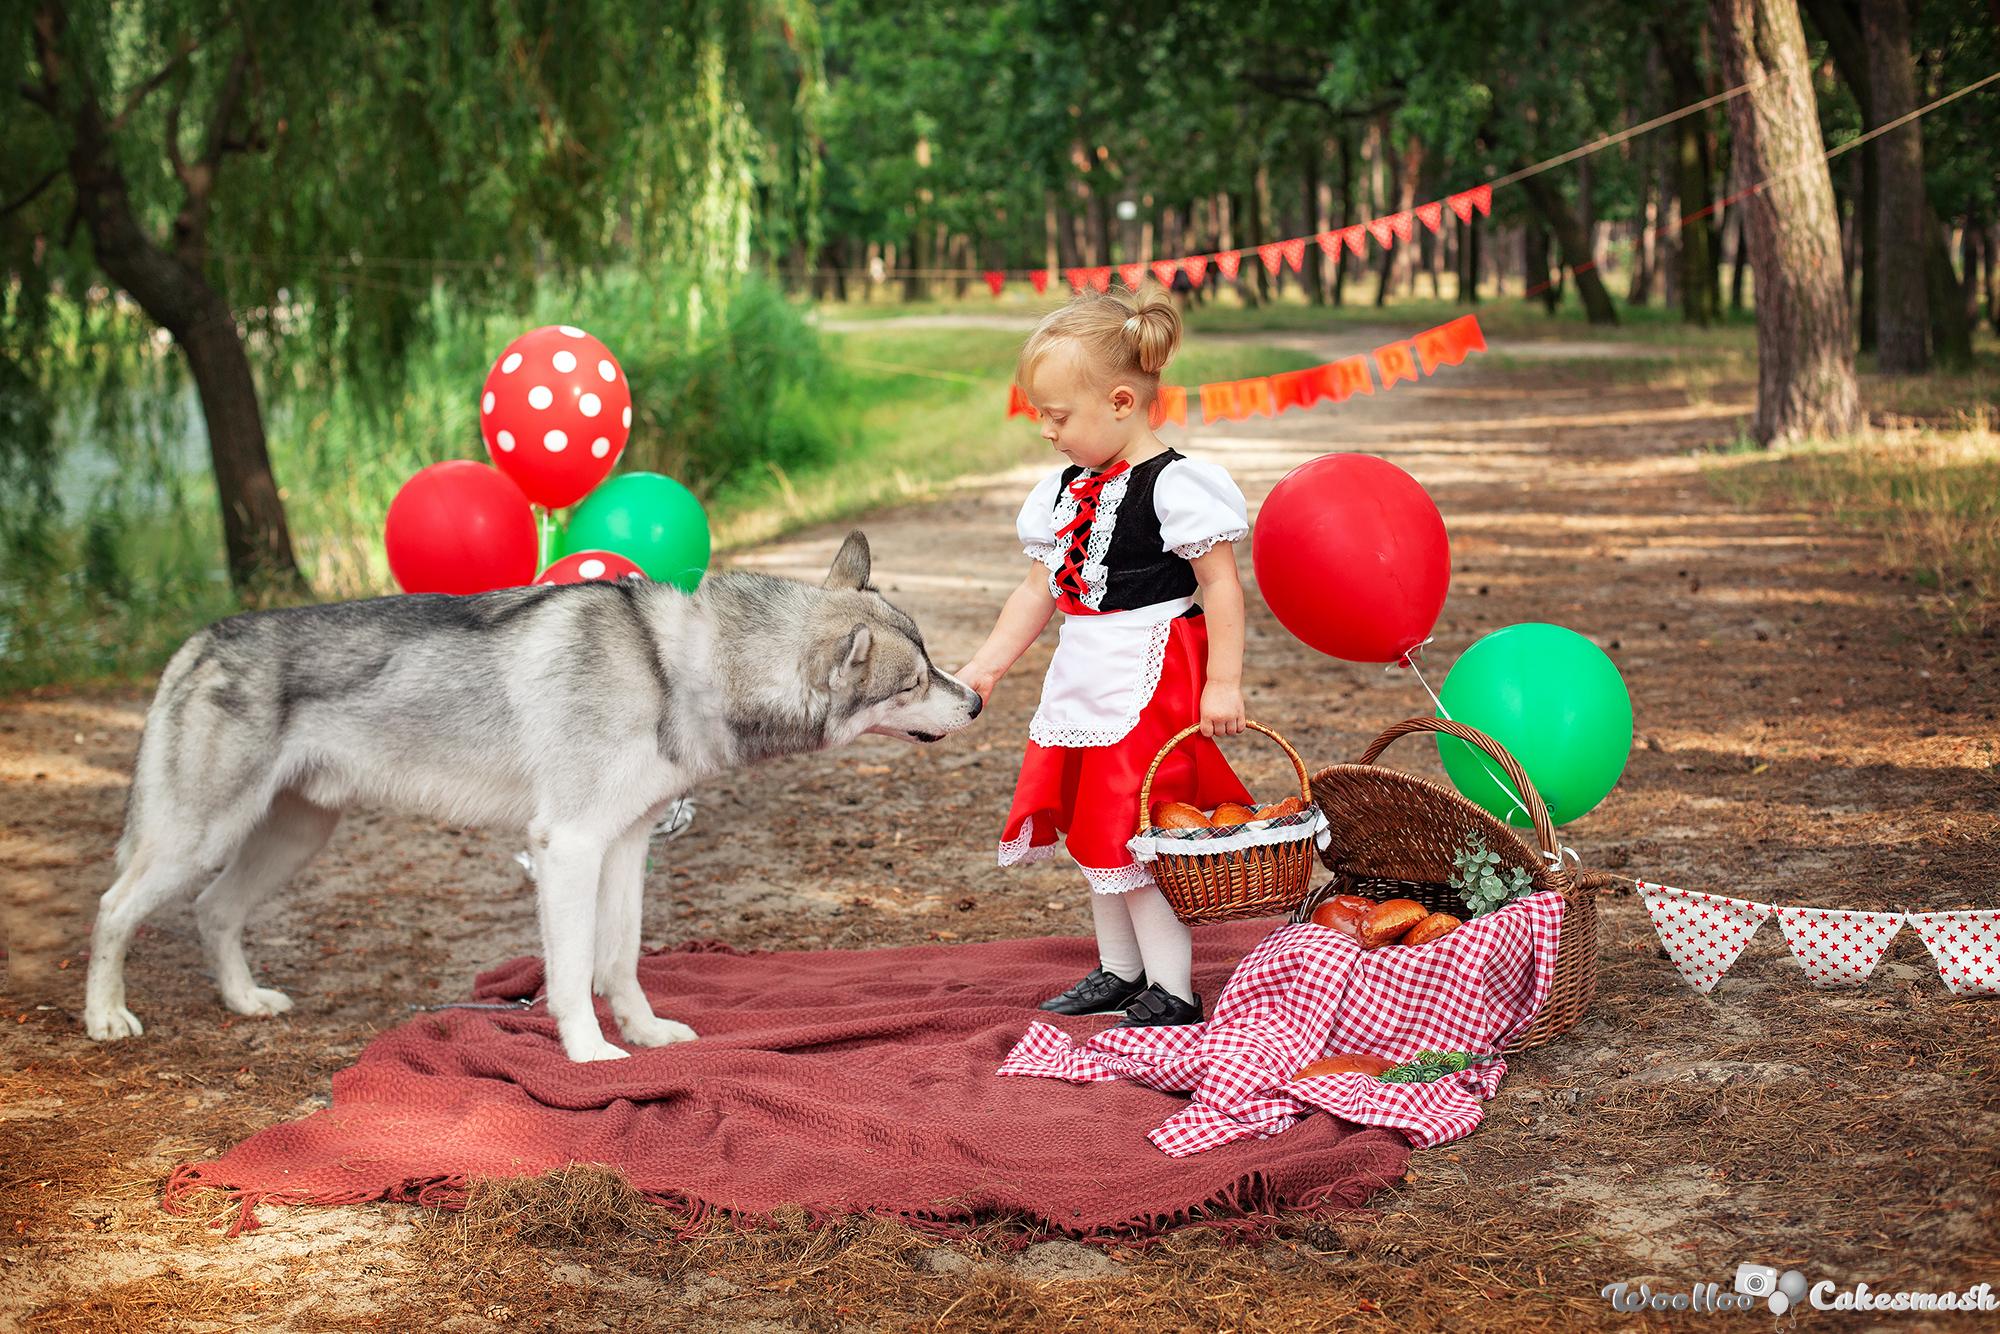 woohoo_cakesmash_Marichka_little_red_3